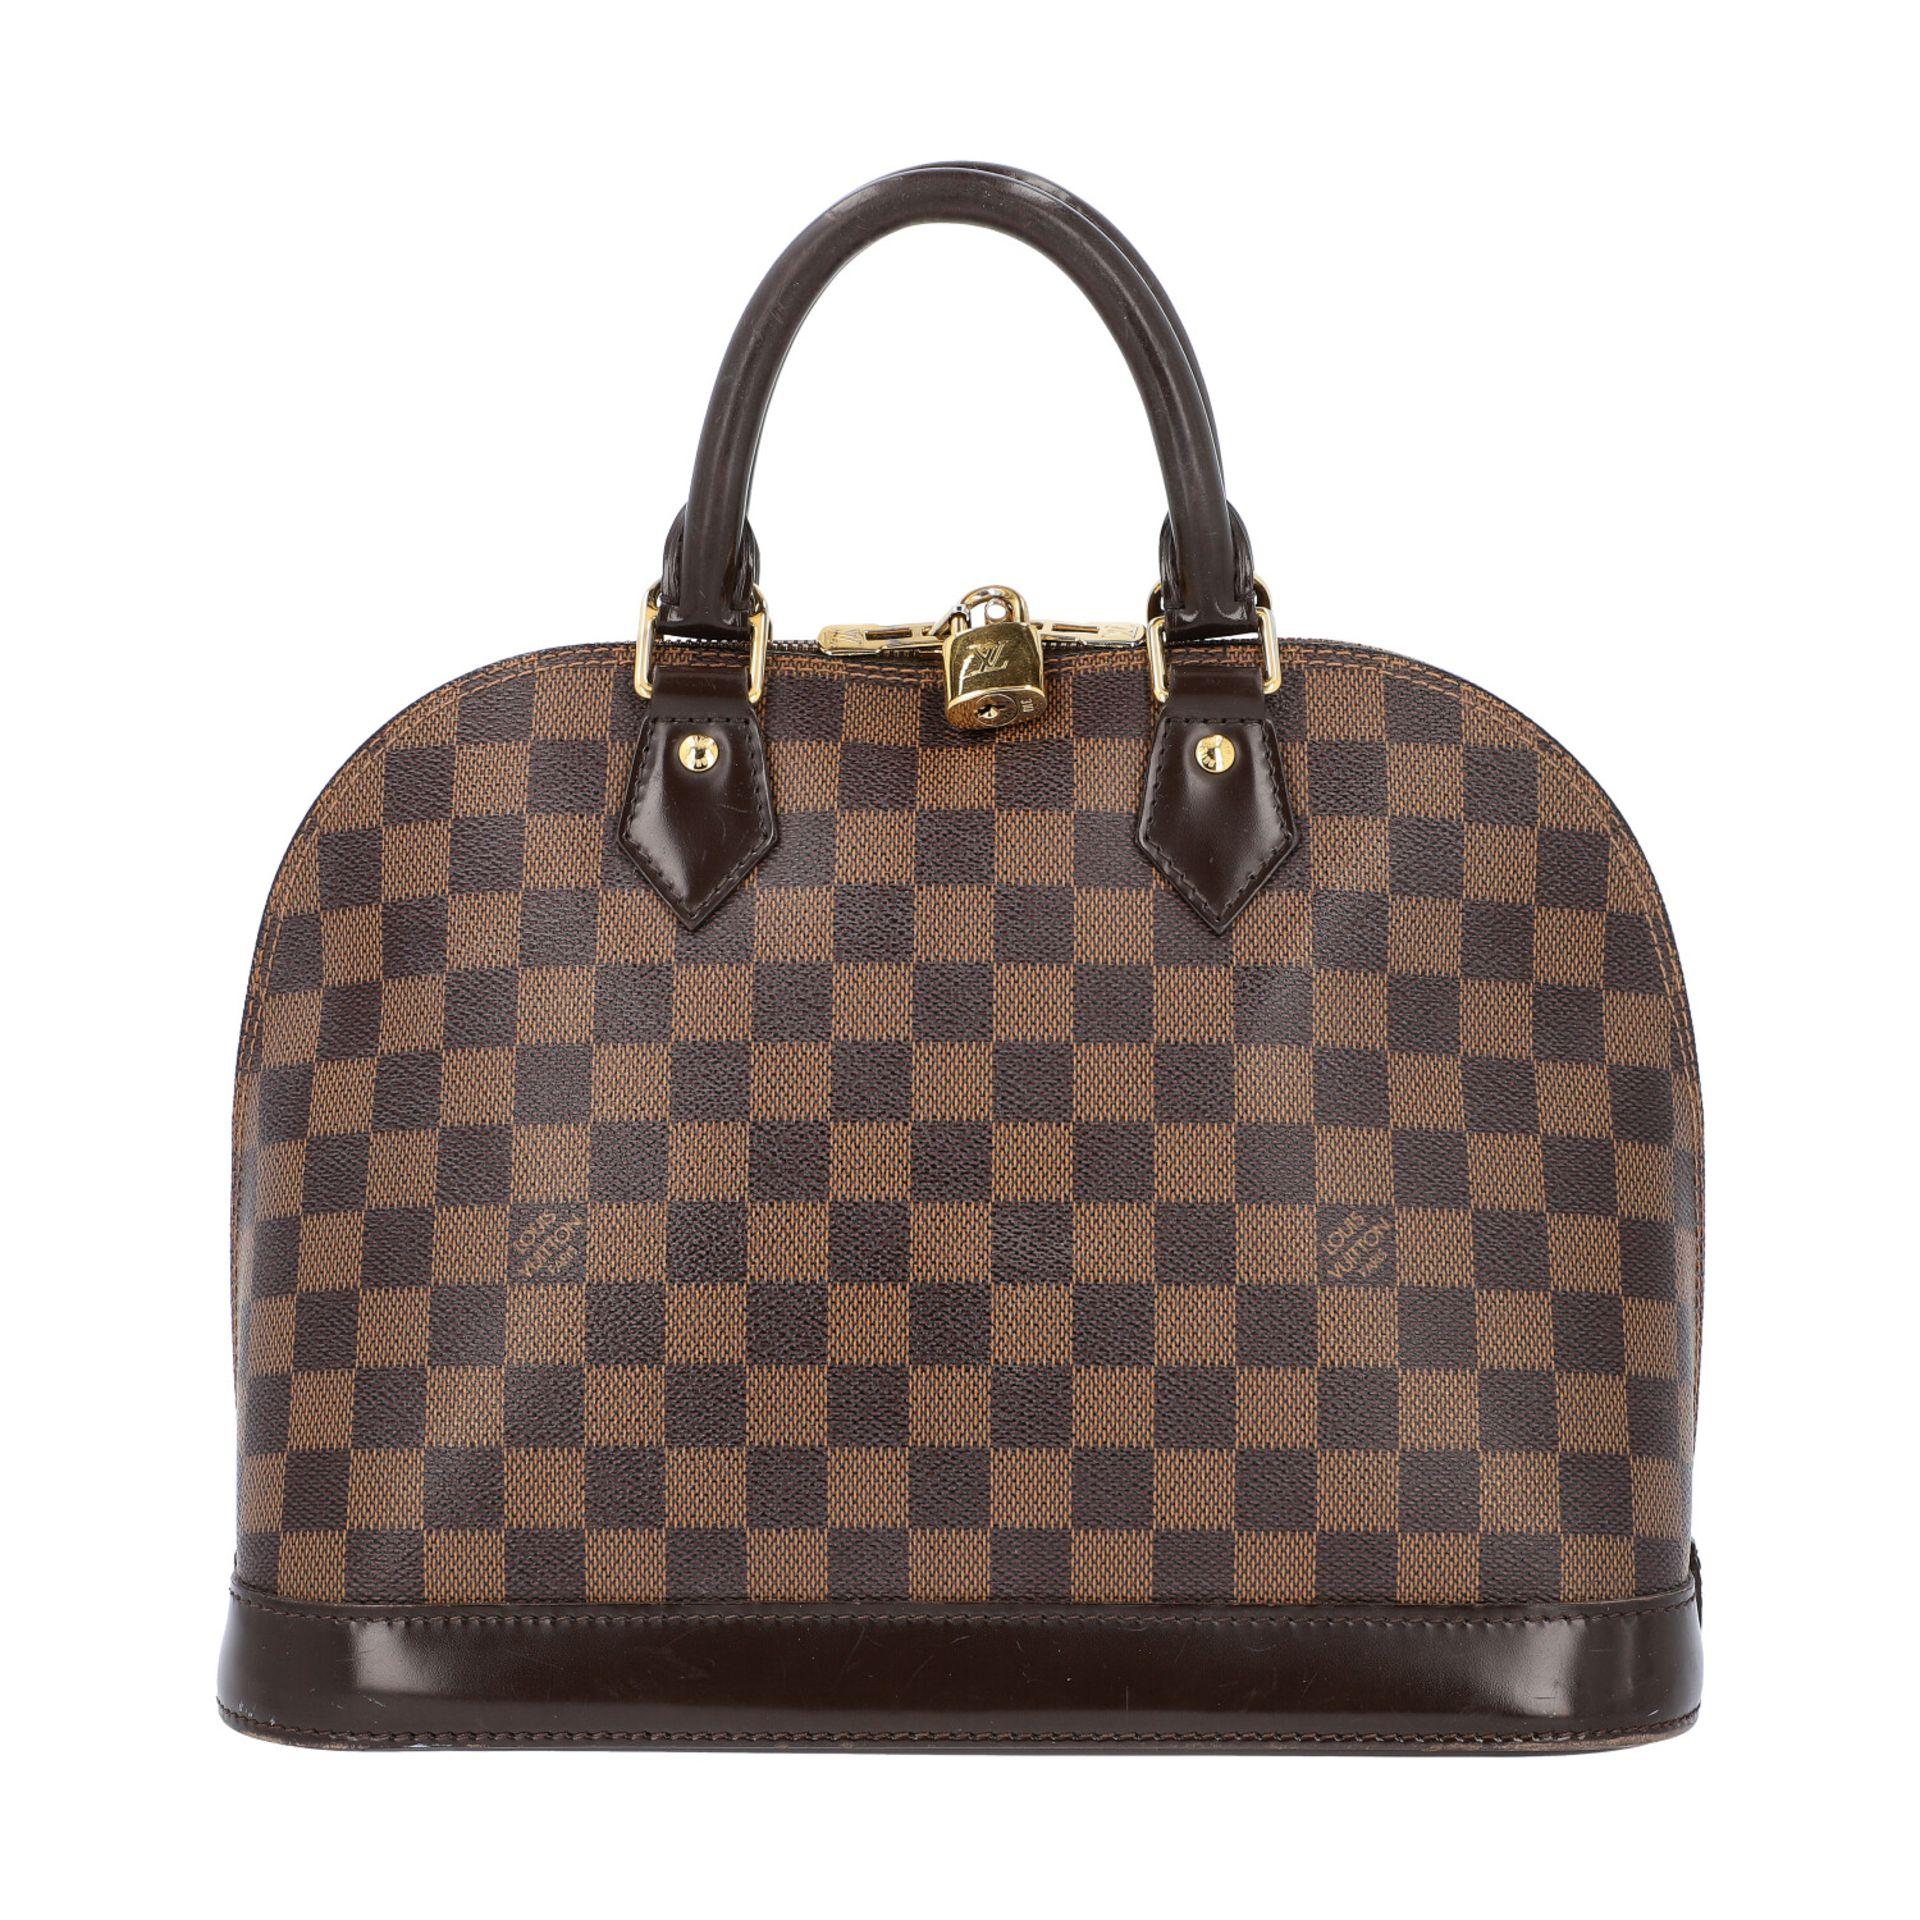 "LOUIS VUITTON Handtasche ""ALMA PM"", Koll. 2010.Akt. NP.: 1.250,-€. Damier Ebene Serie mit"